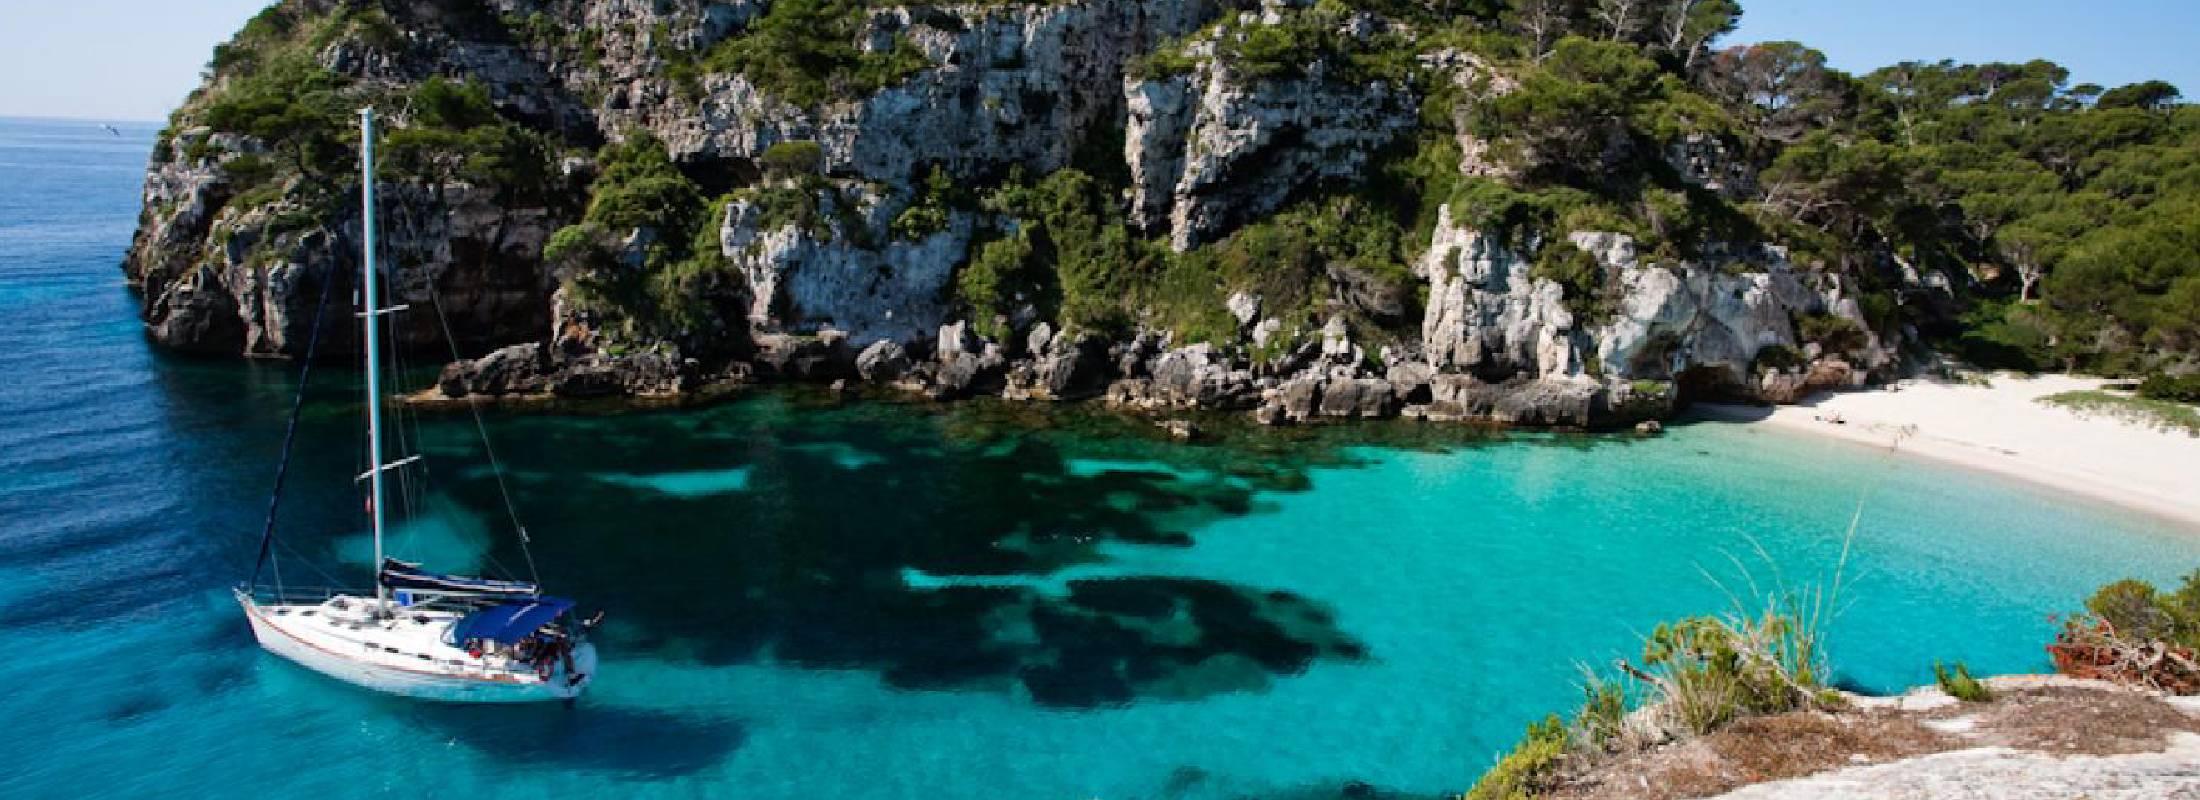 Cala del retiro de yoga en Menorca